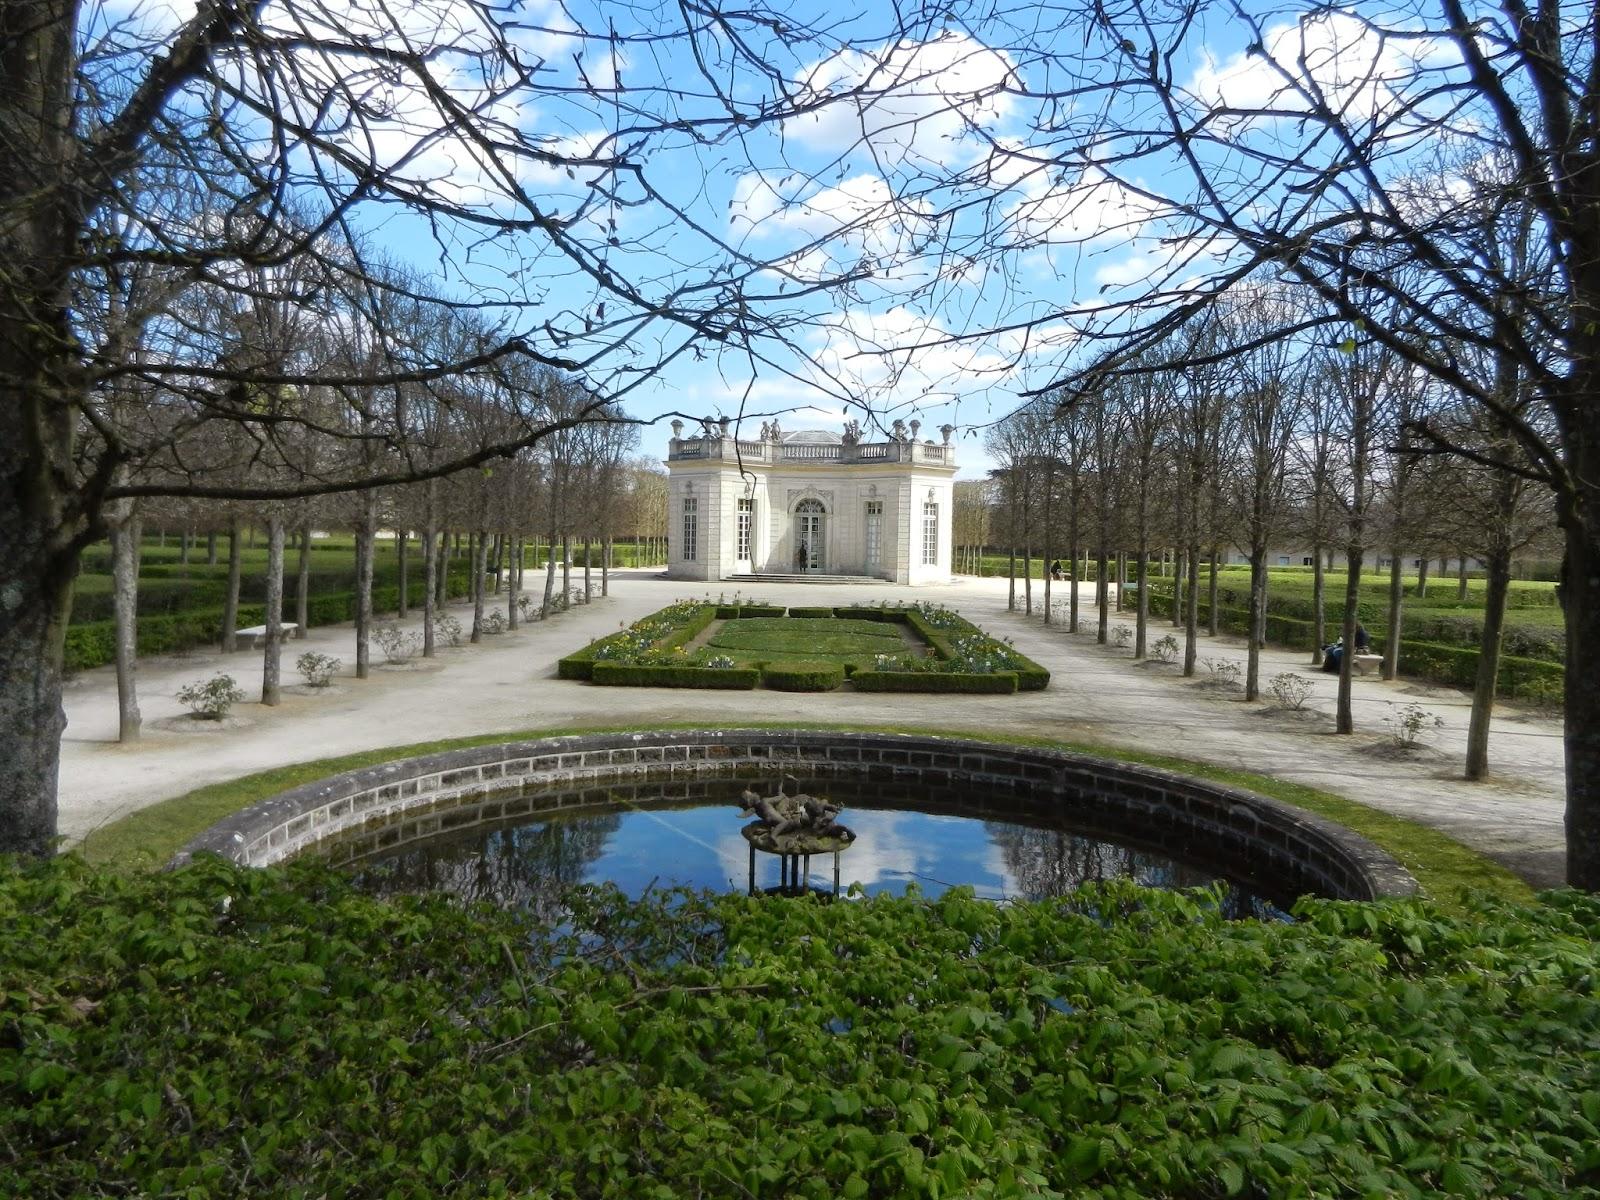 vicarious travelling: Paris 2014 - Day 11, Versailles